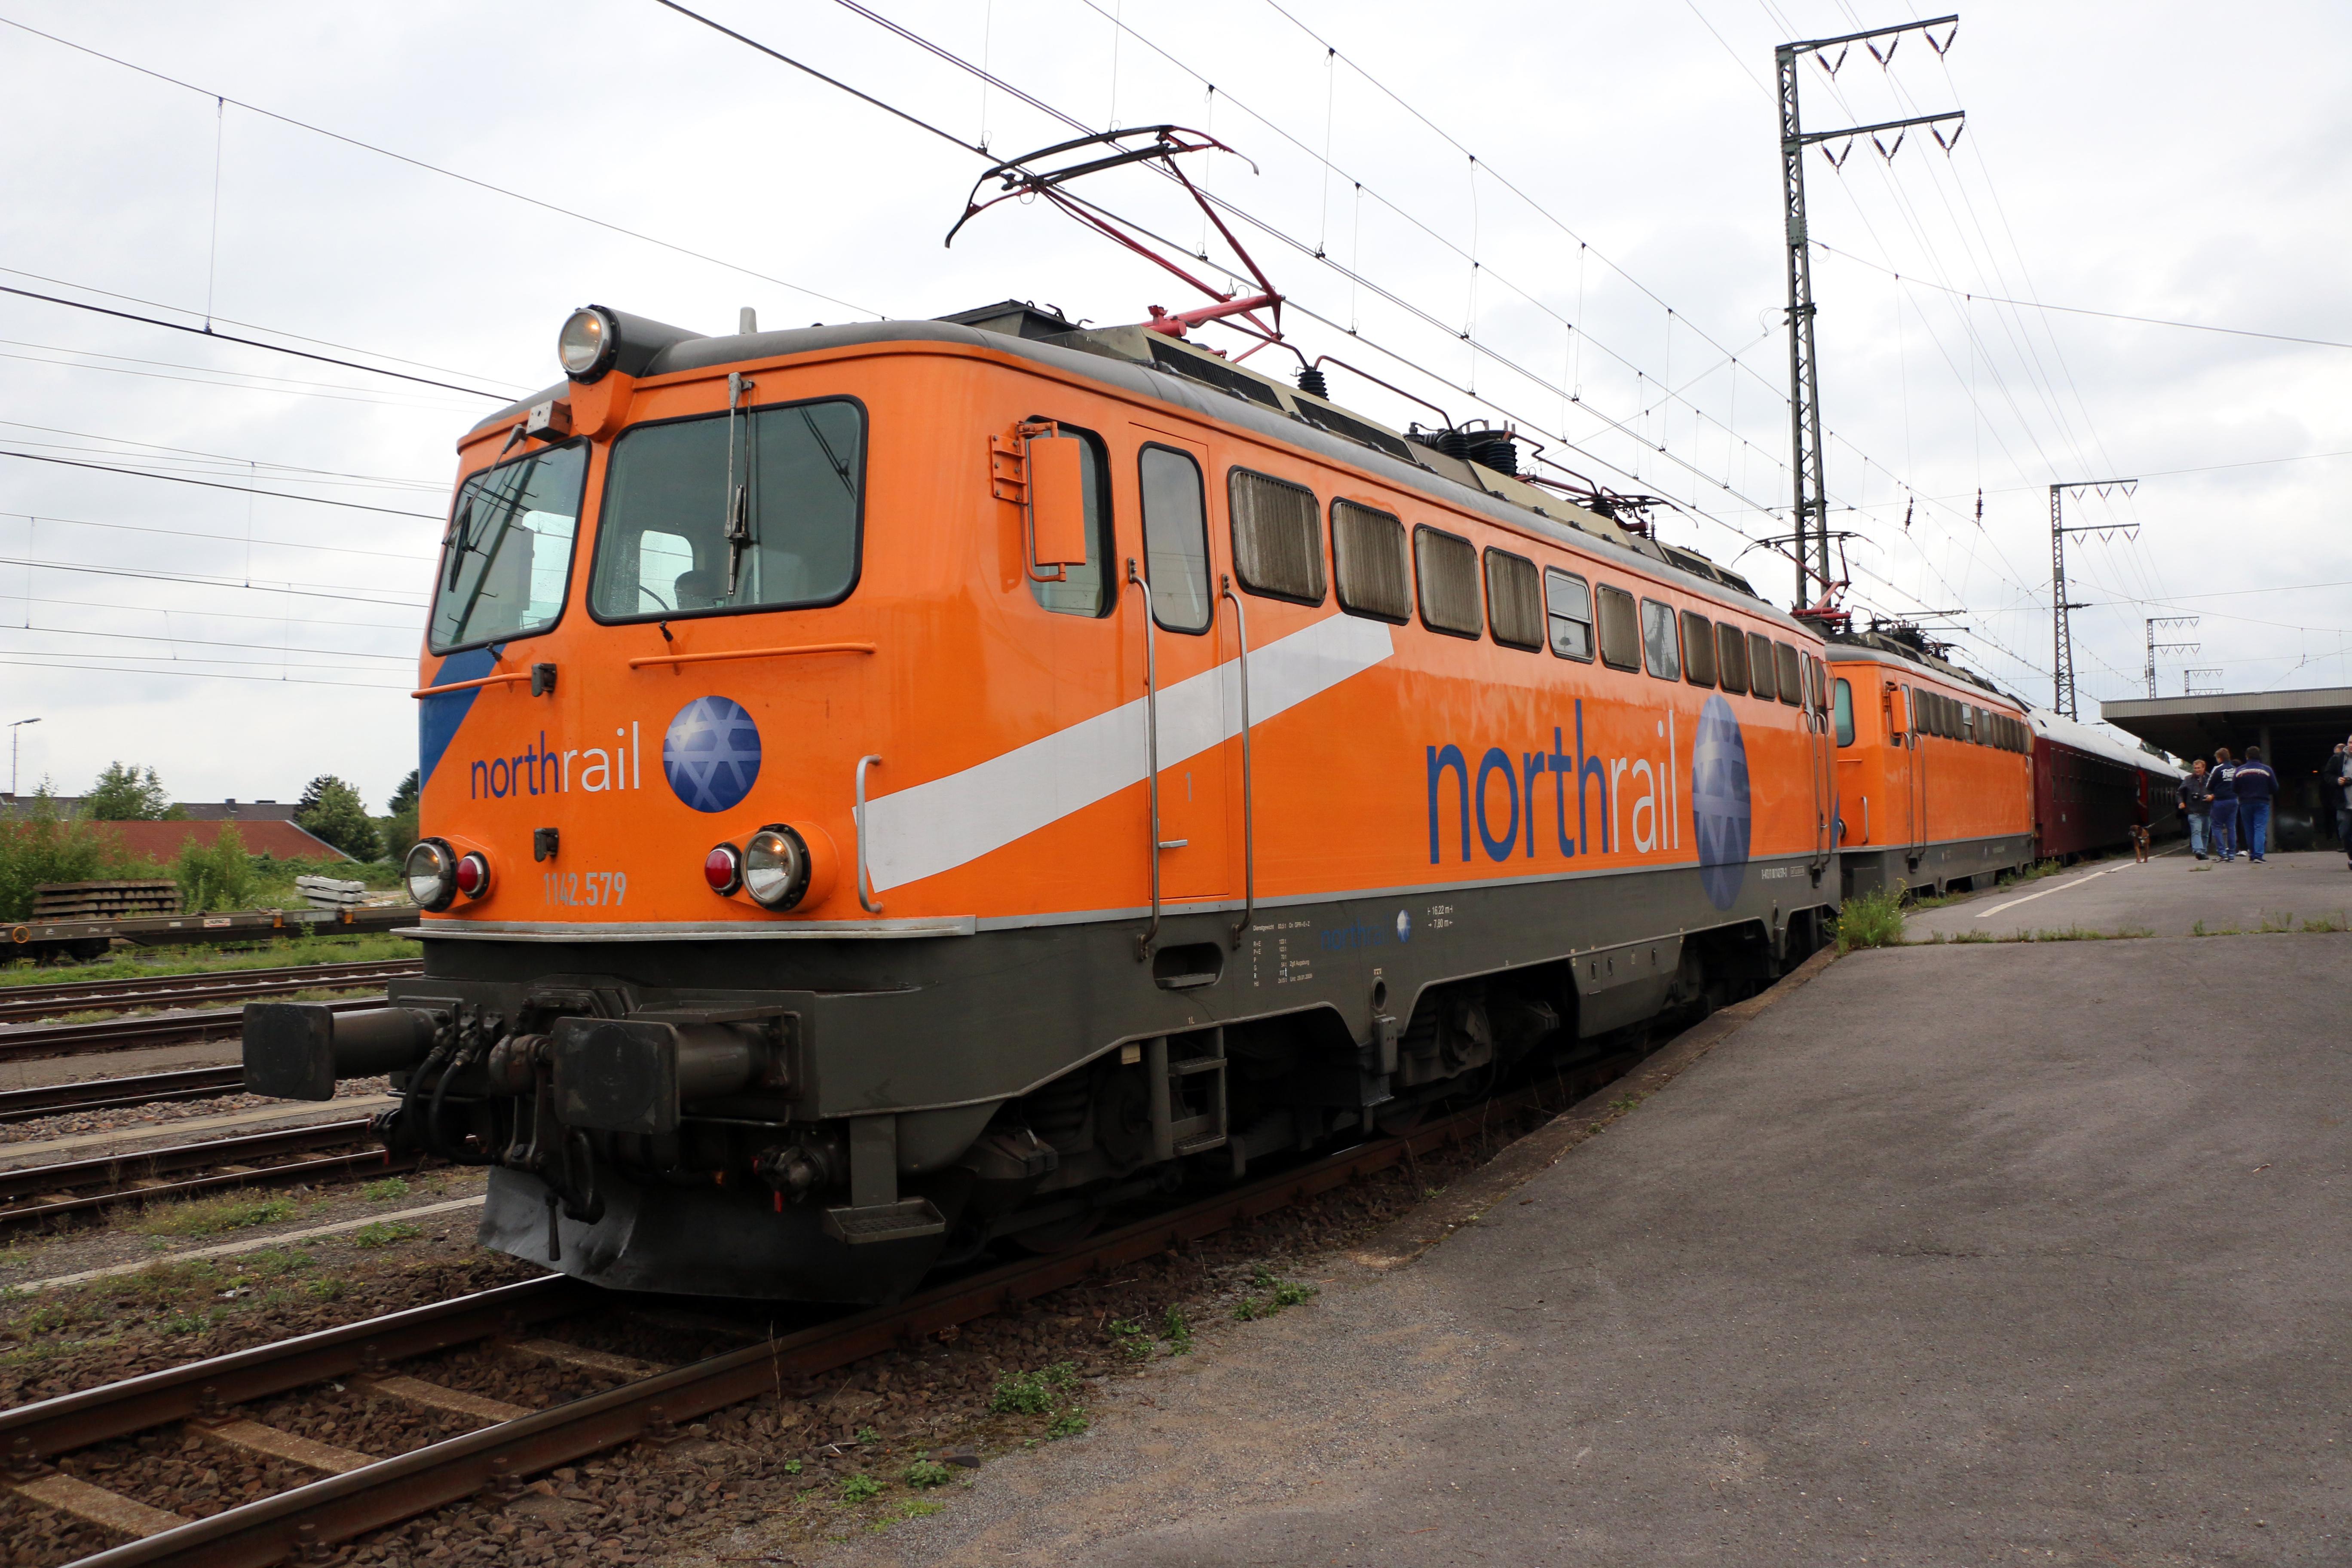 File:NorthRail 1142 635 en 1142 579 , Emmerich (14959920072).jpg